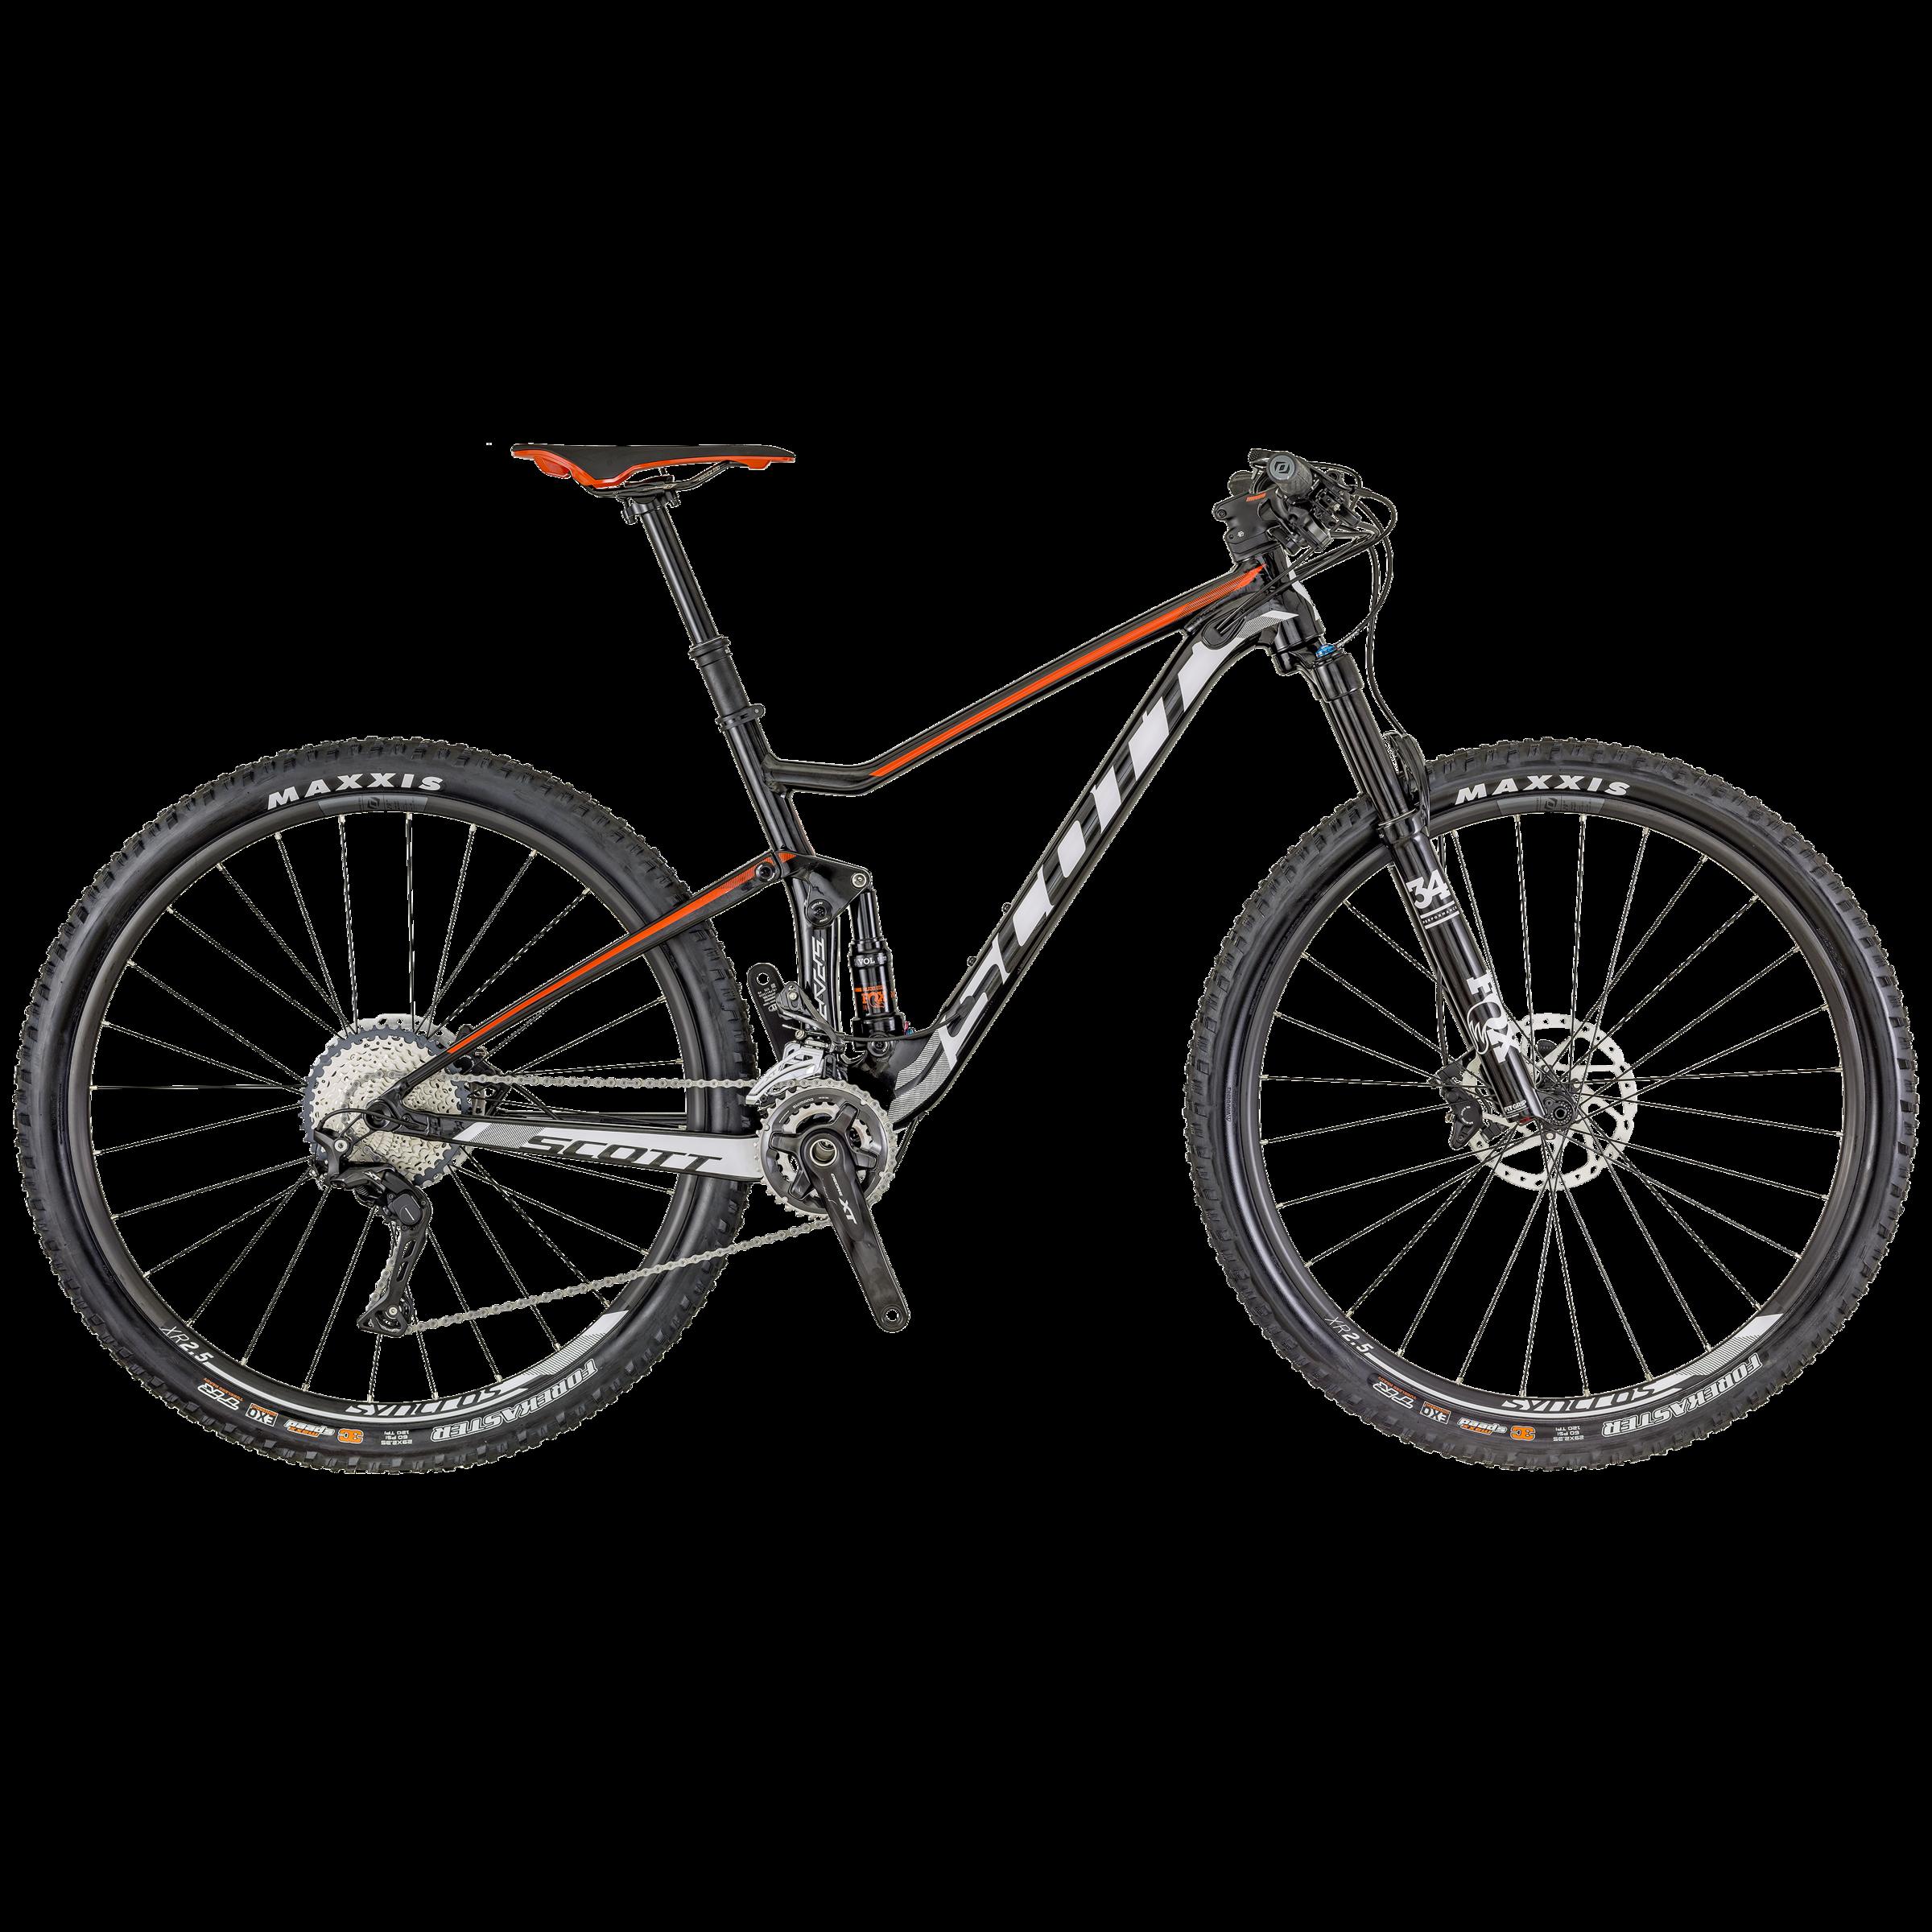 9504e8bcd54 Scott Spark 930 - Bicycle Village